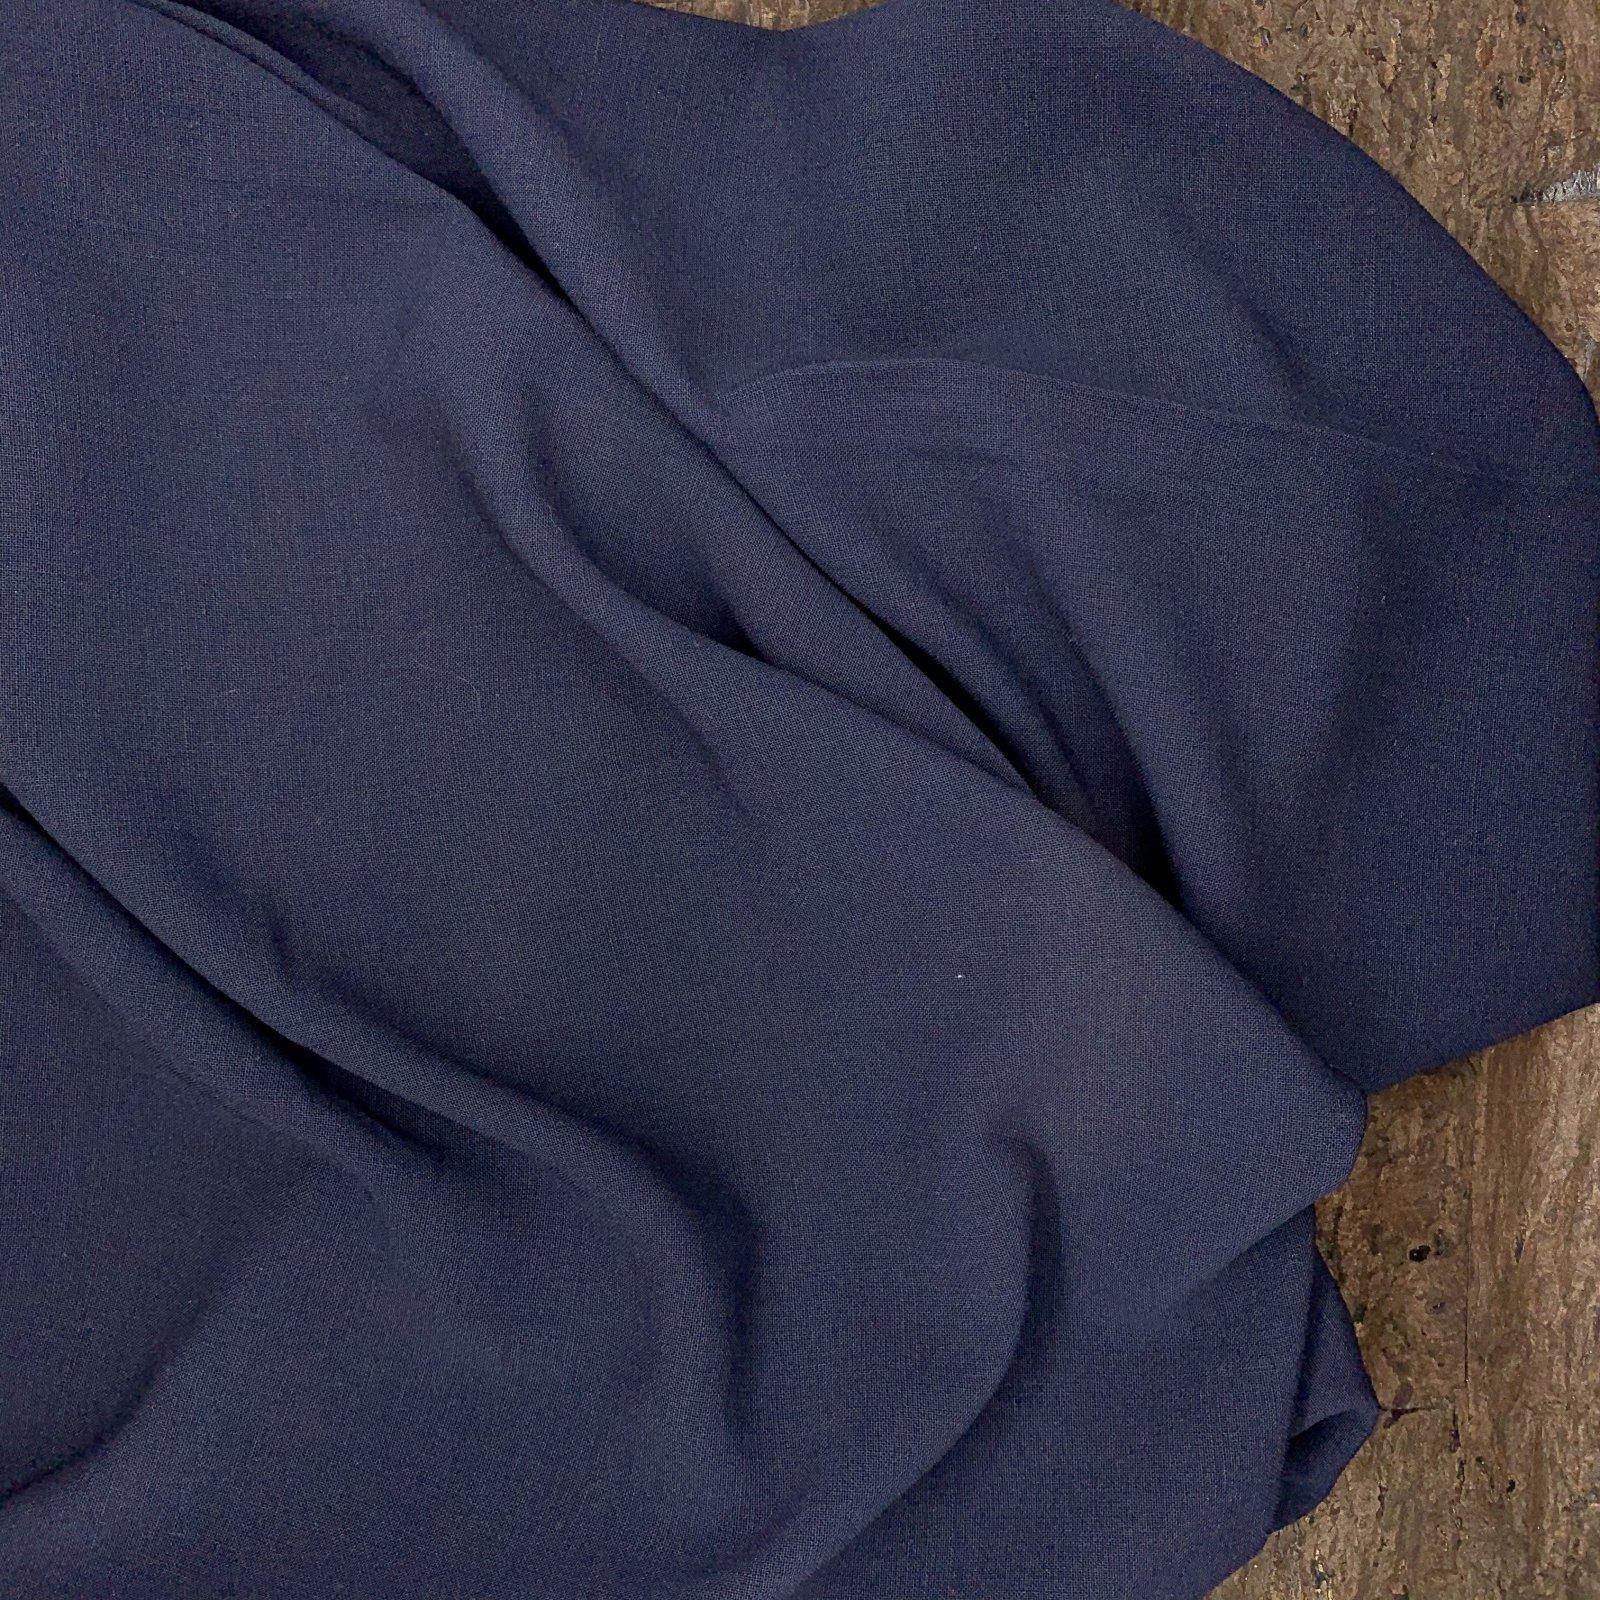 Navy Stretch Crepe - Italian Wool